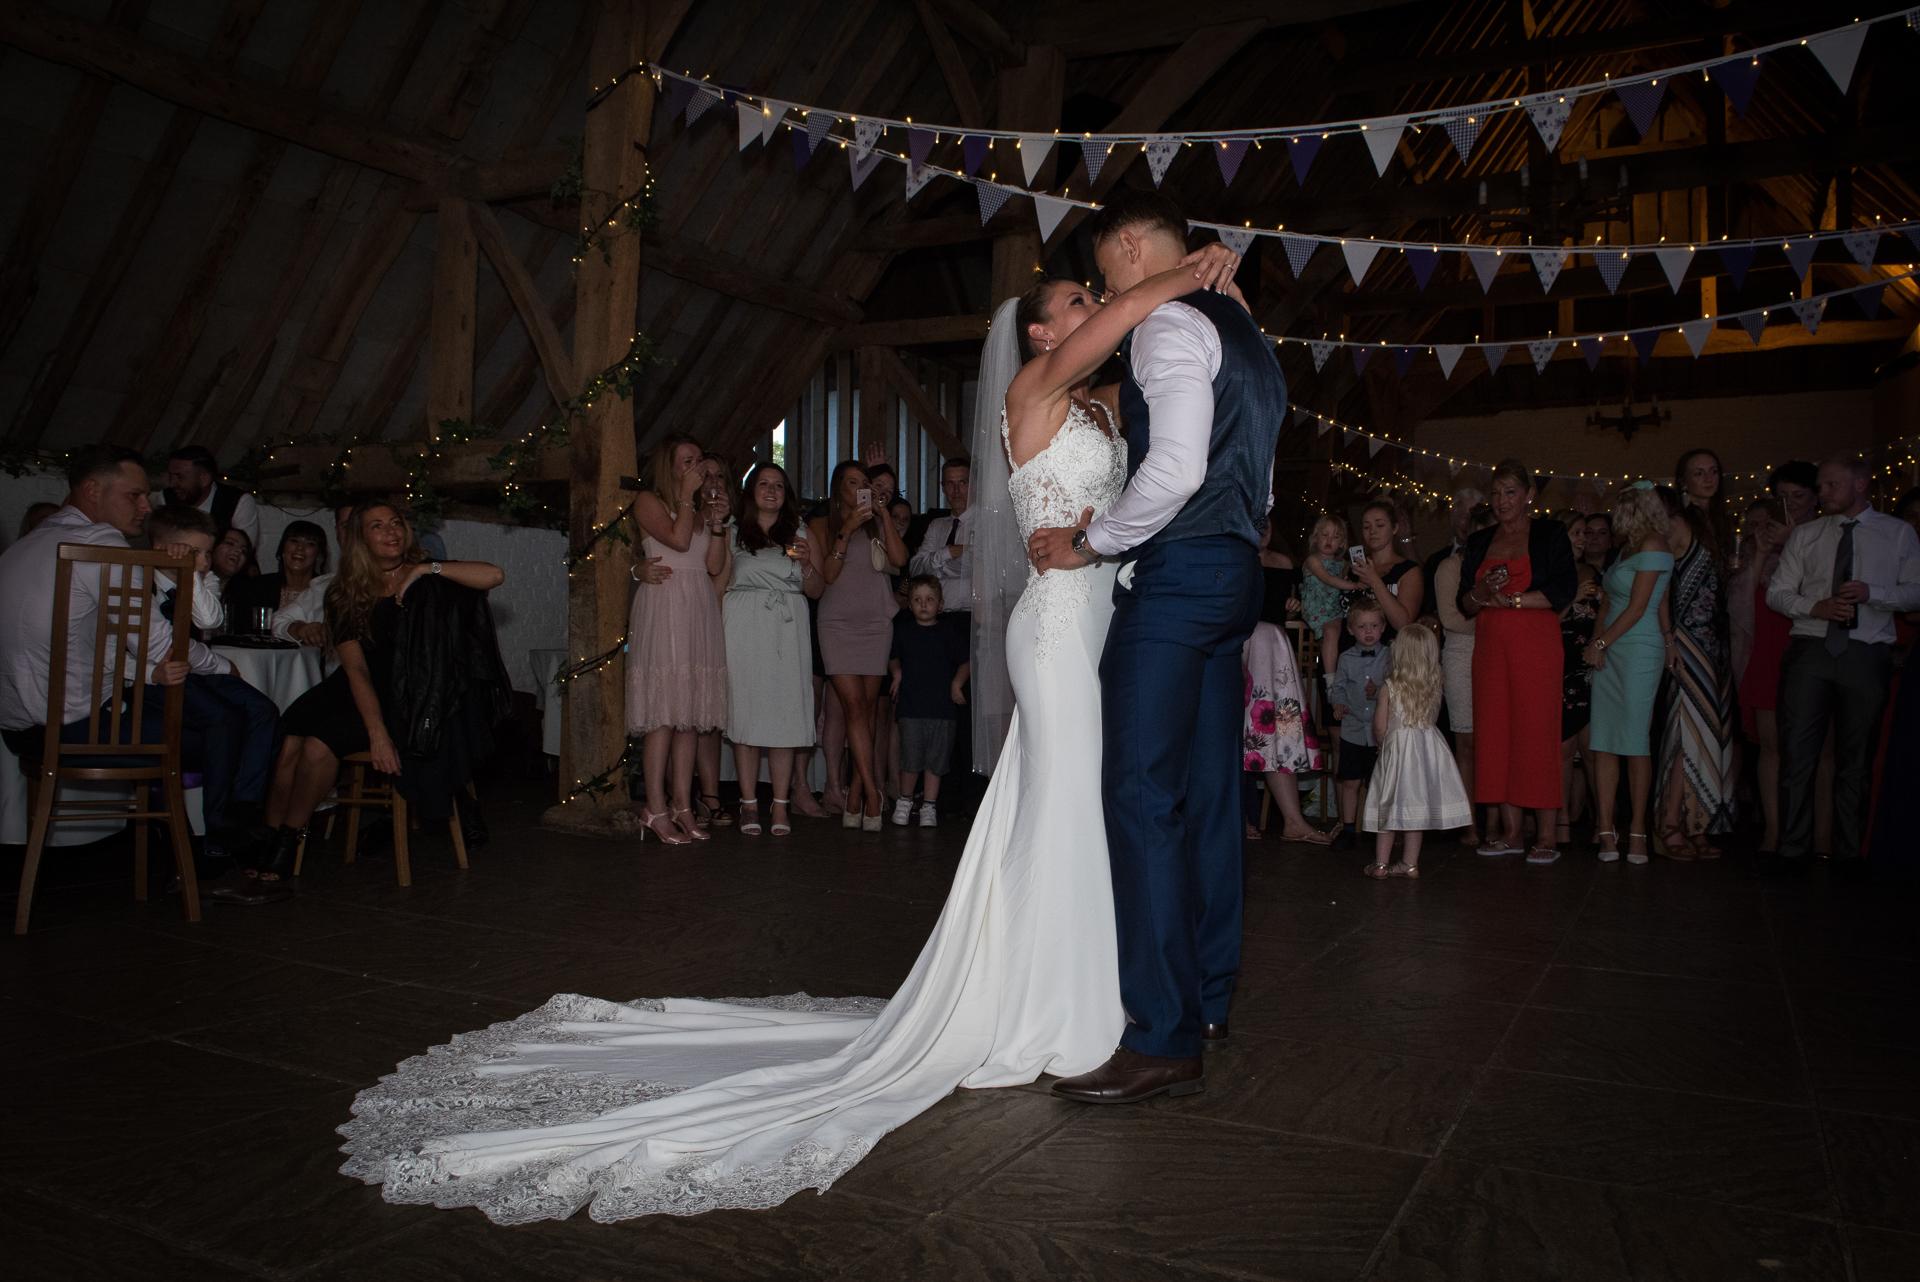 Ufton Court Wedding Photography43.JPG